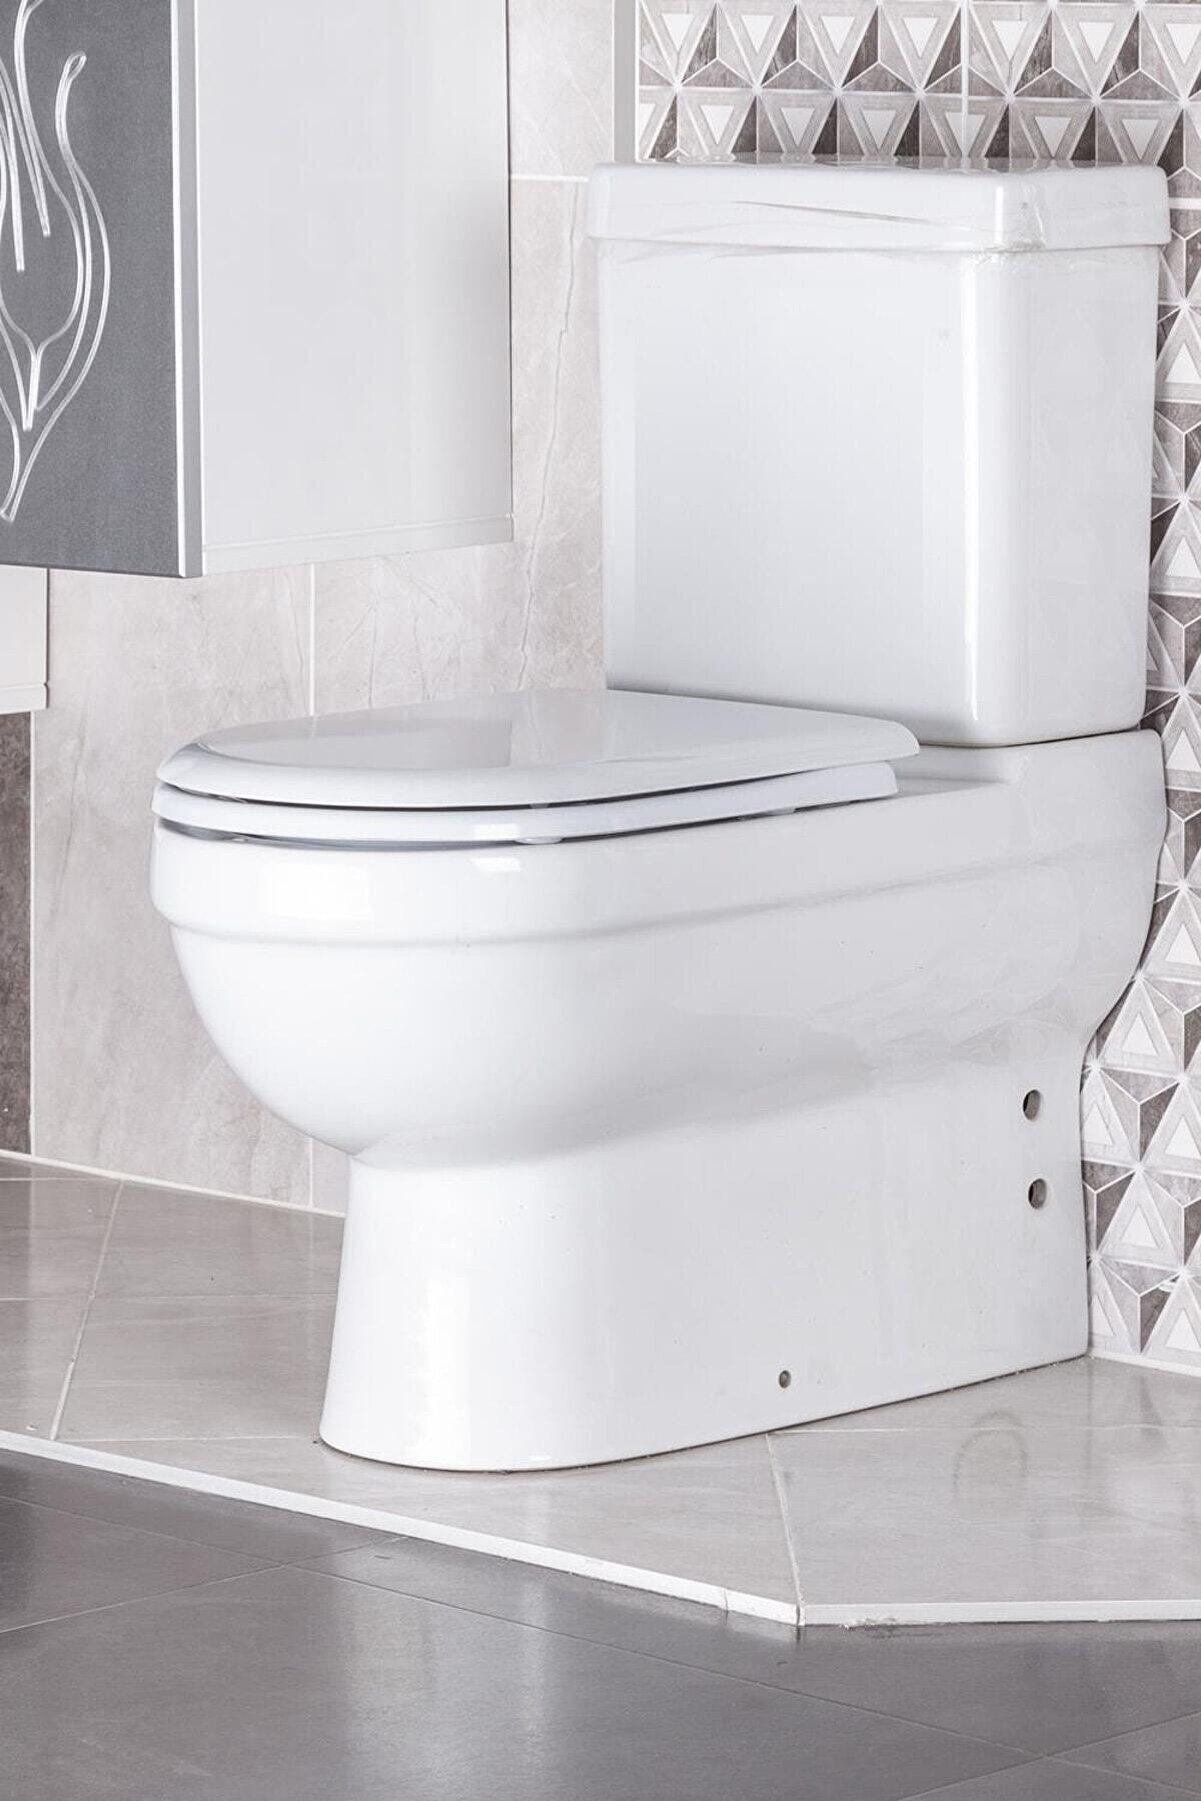 Teknotel Ayakli Tuvalet Kağıtlık Ve Çöp Kovasi